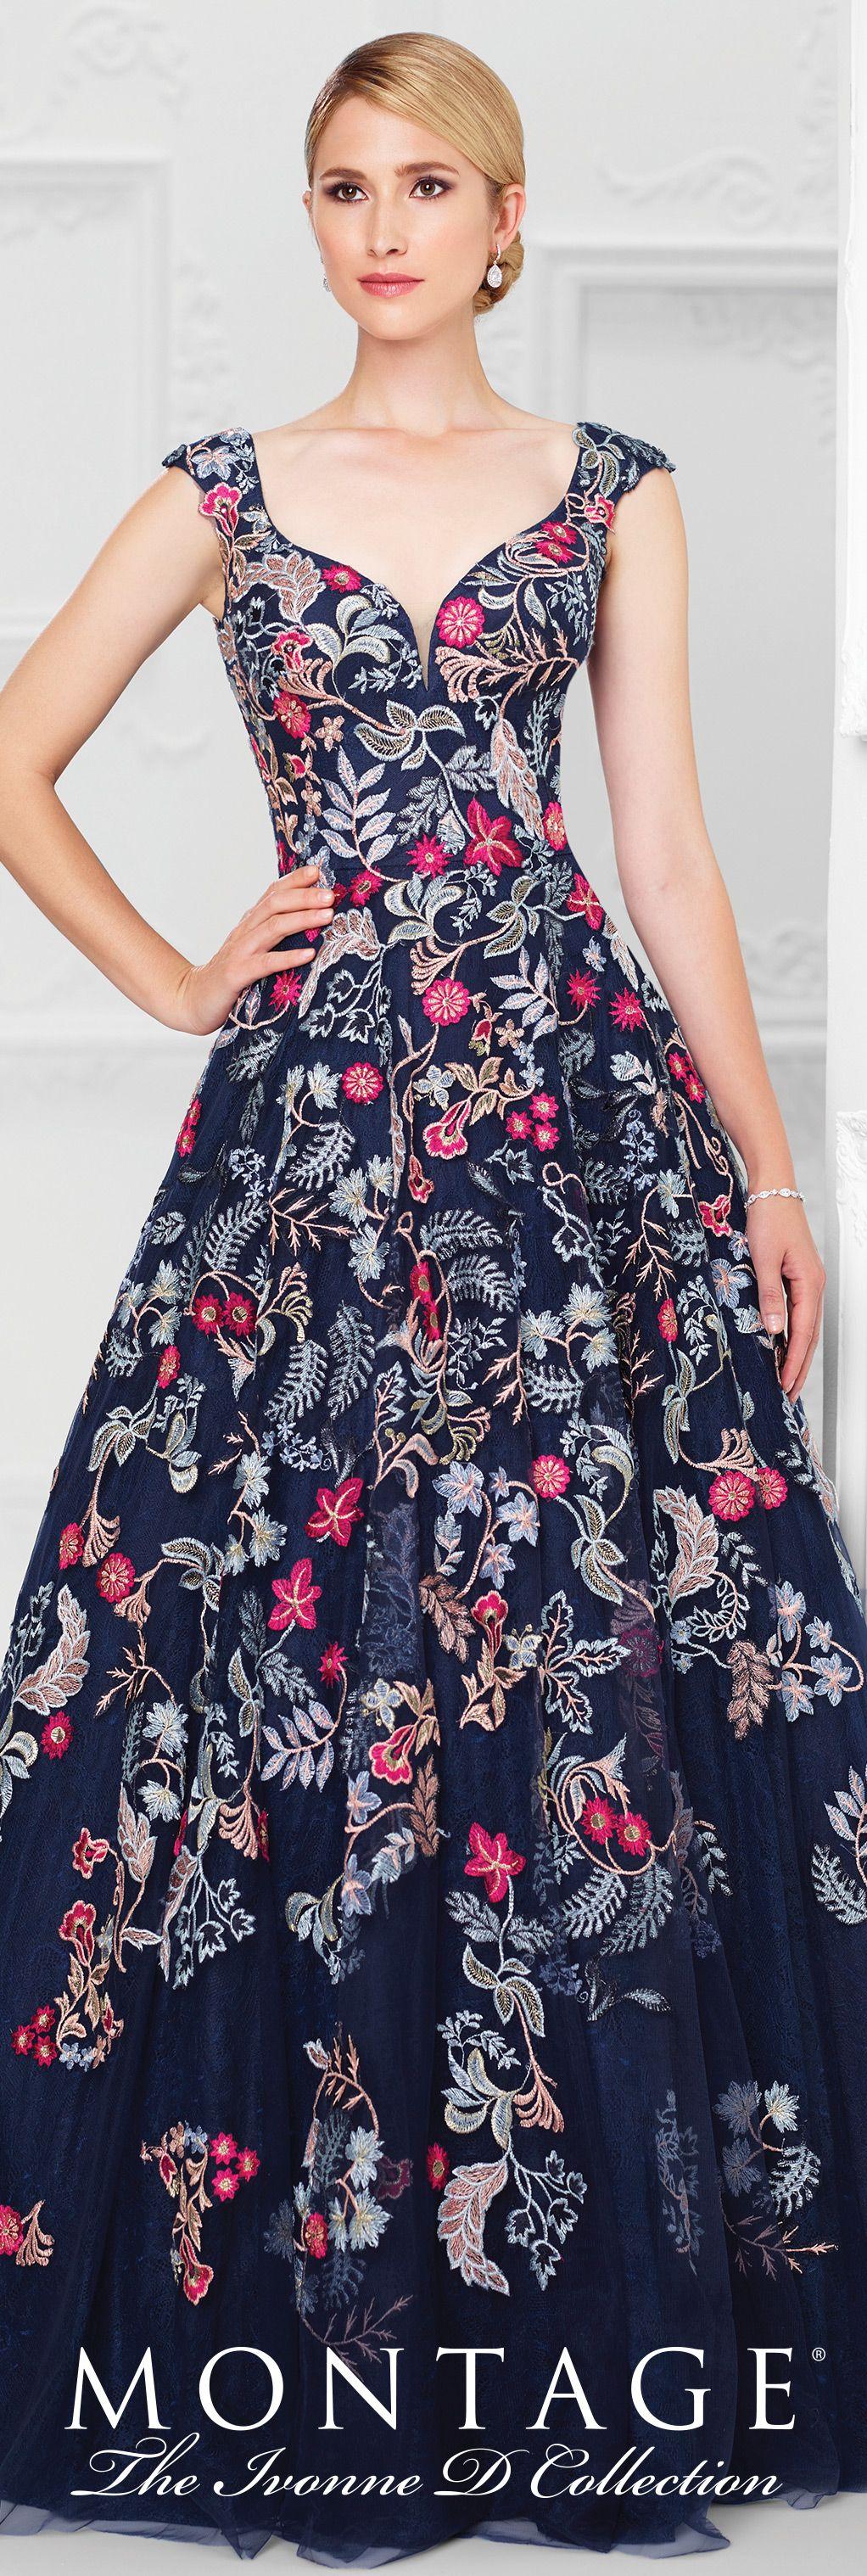 Ivonne D - Evening Dresses - 117D76 | Vestiditos, Vestido largo y ...